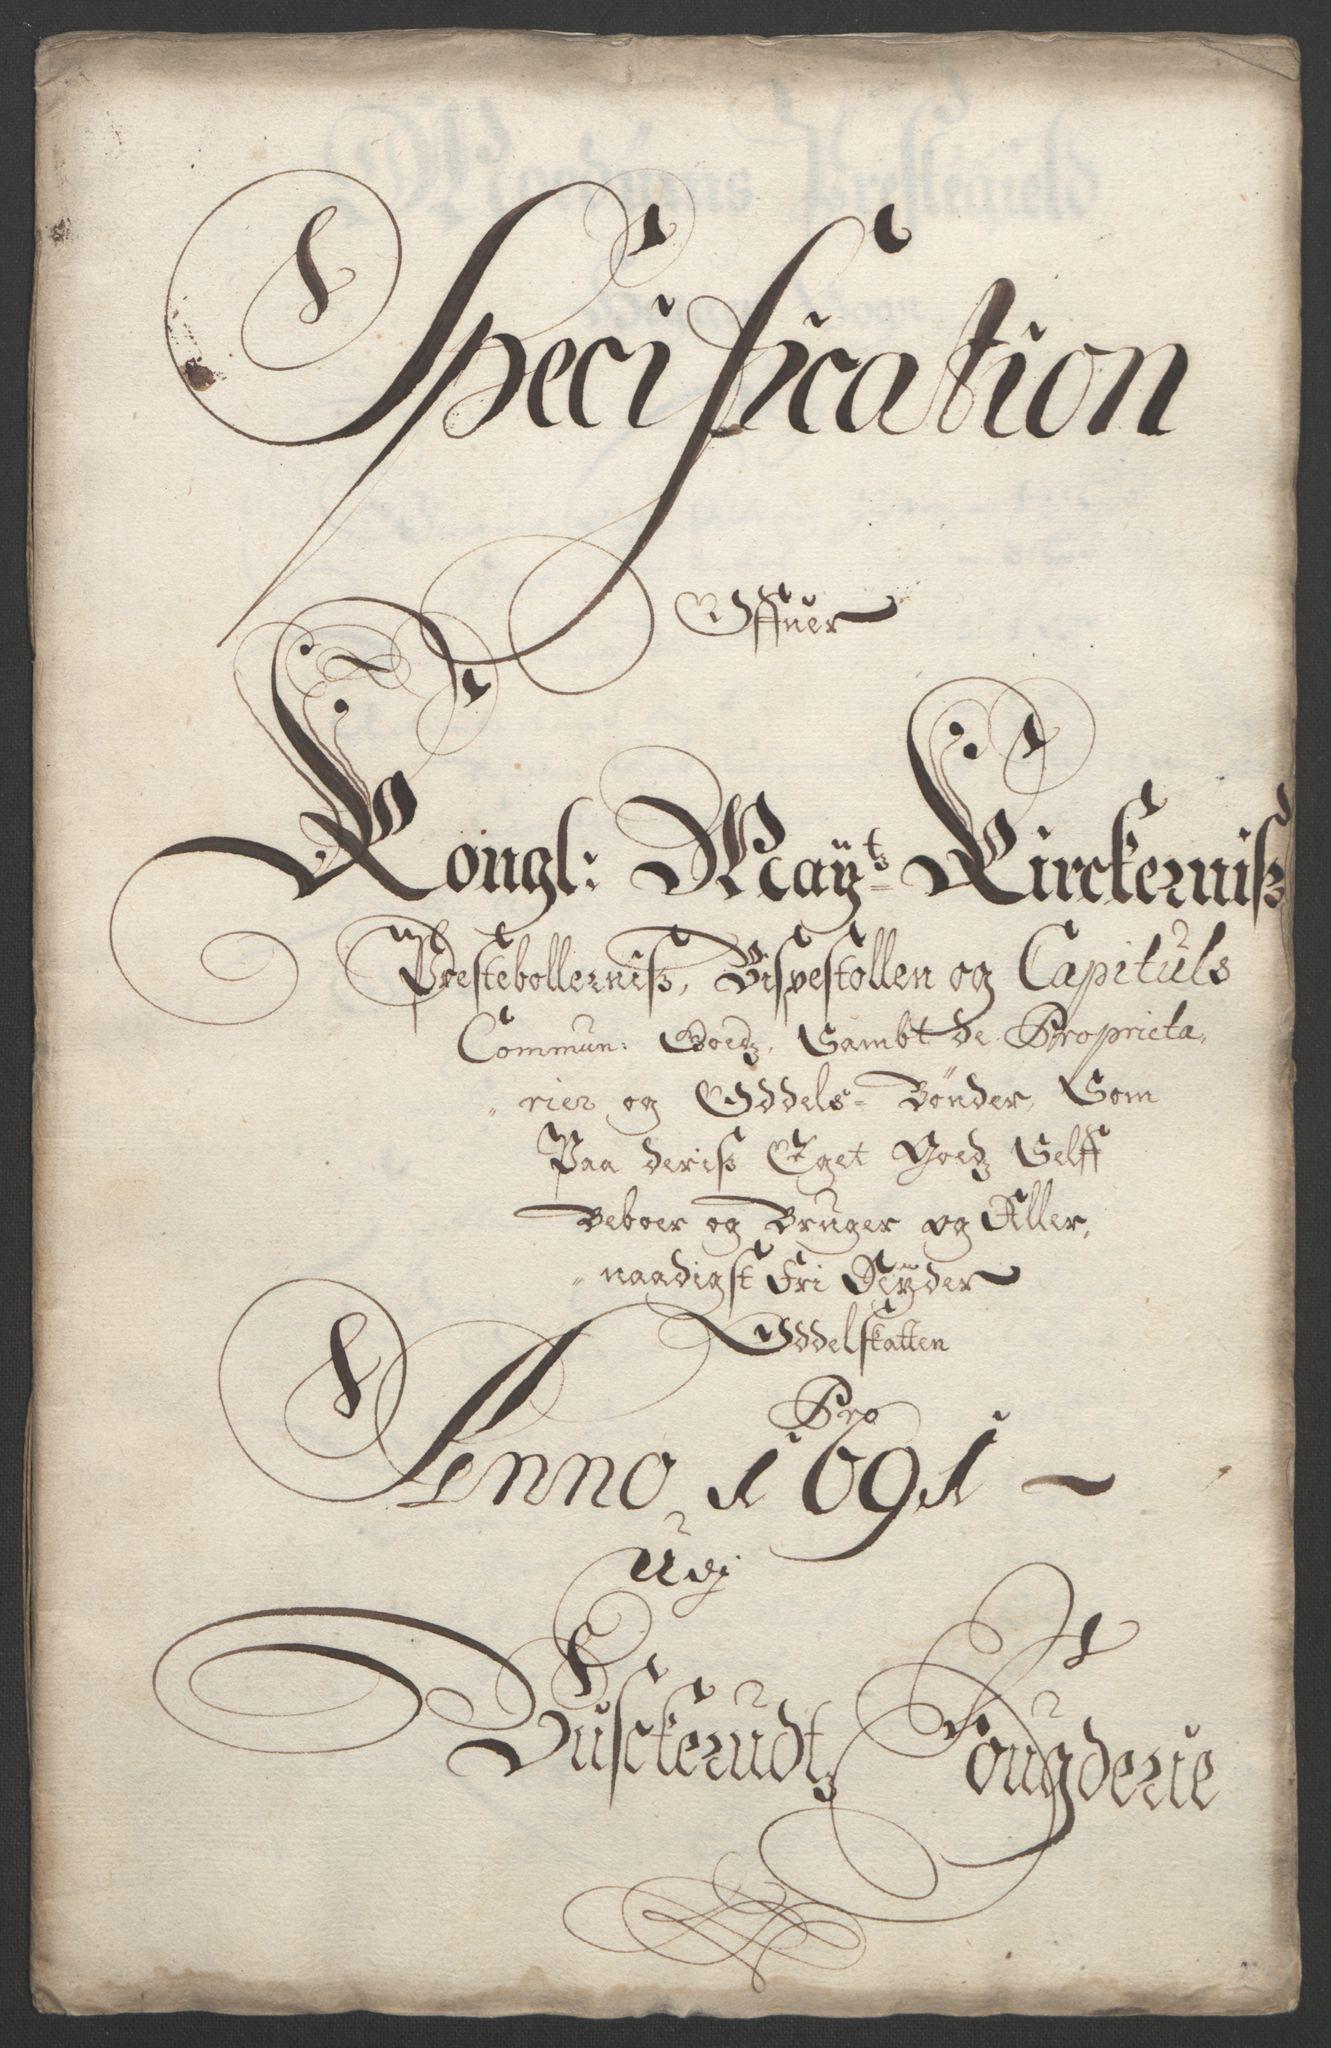 RA, Rentekammeret inntil 1814, Reviderte regnskaper, Fogderegnskap, R25/L1681: Fogderegnskap Buskerud, 1691-1692, s. 277